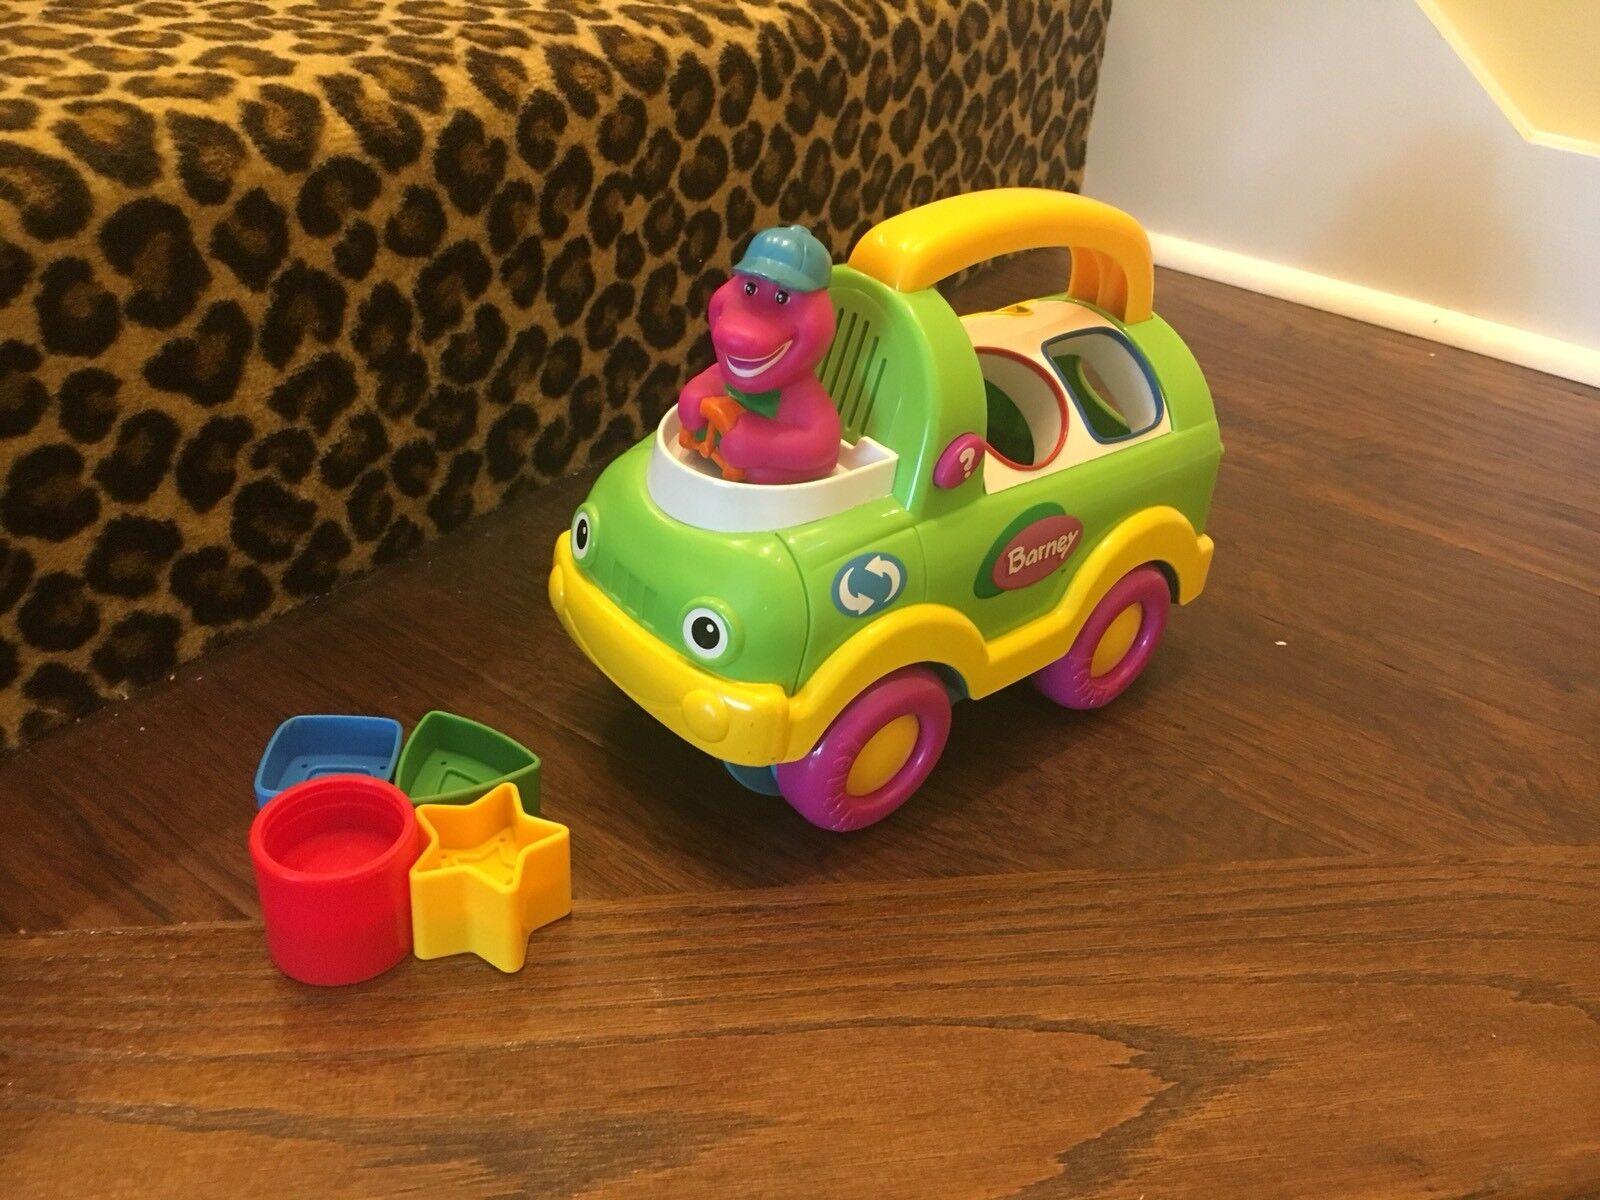 Barney The Dinosaur Cleanup Shape Sorter Vehicle